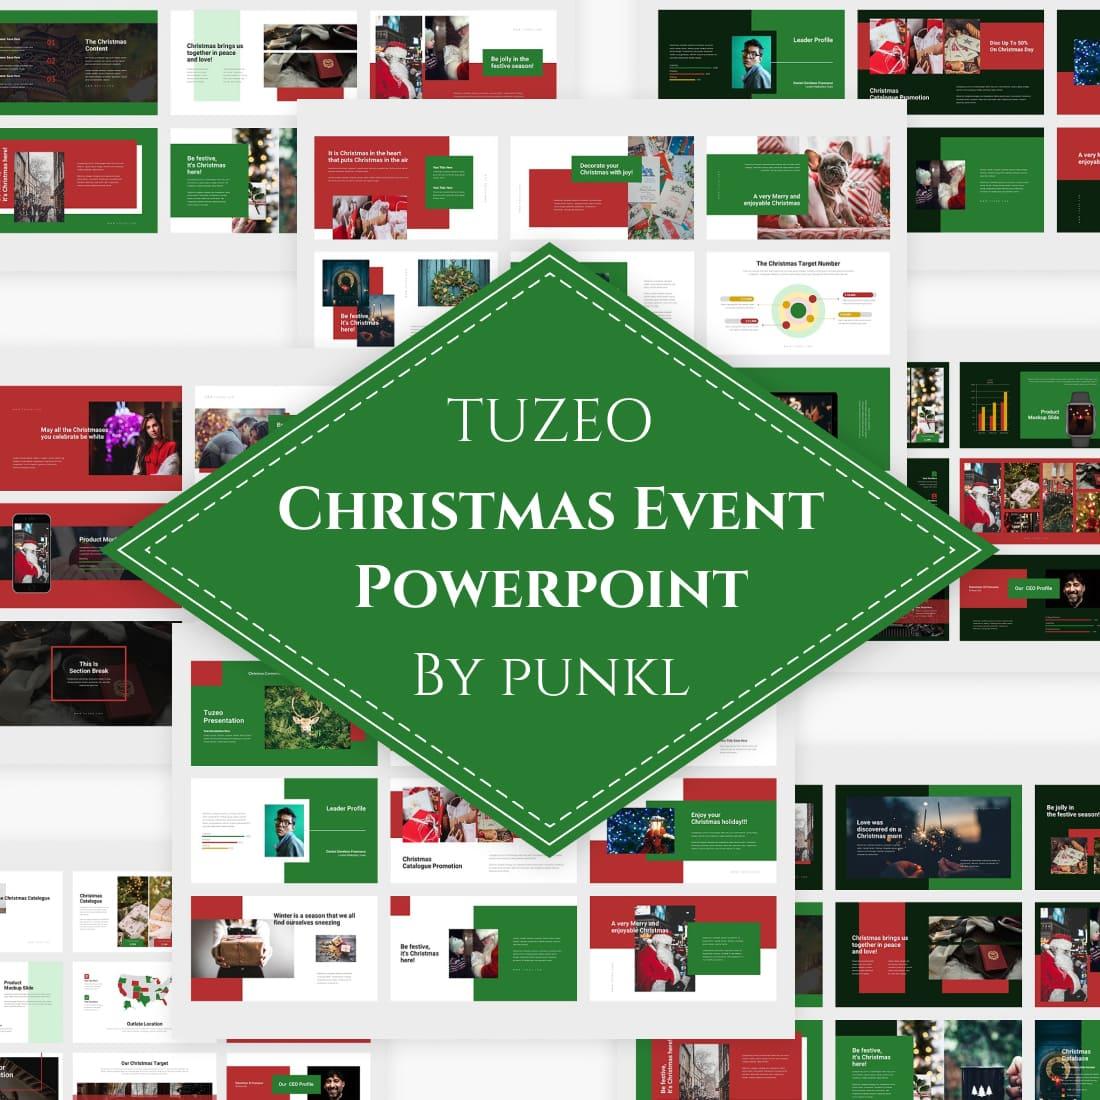 01 Tuzeo Christmas Event Powerpoint 1100x1100 1